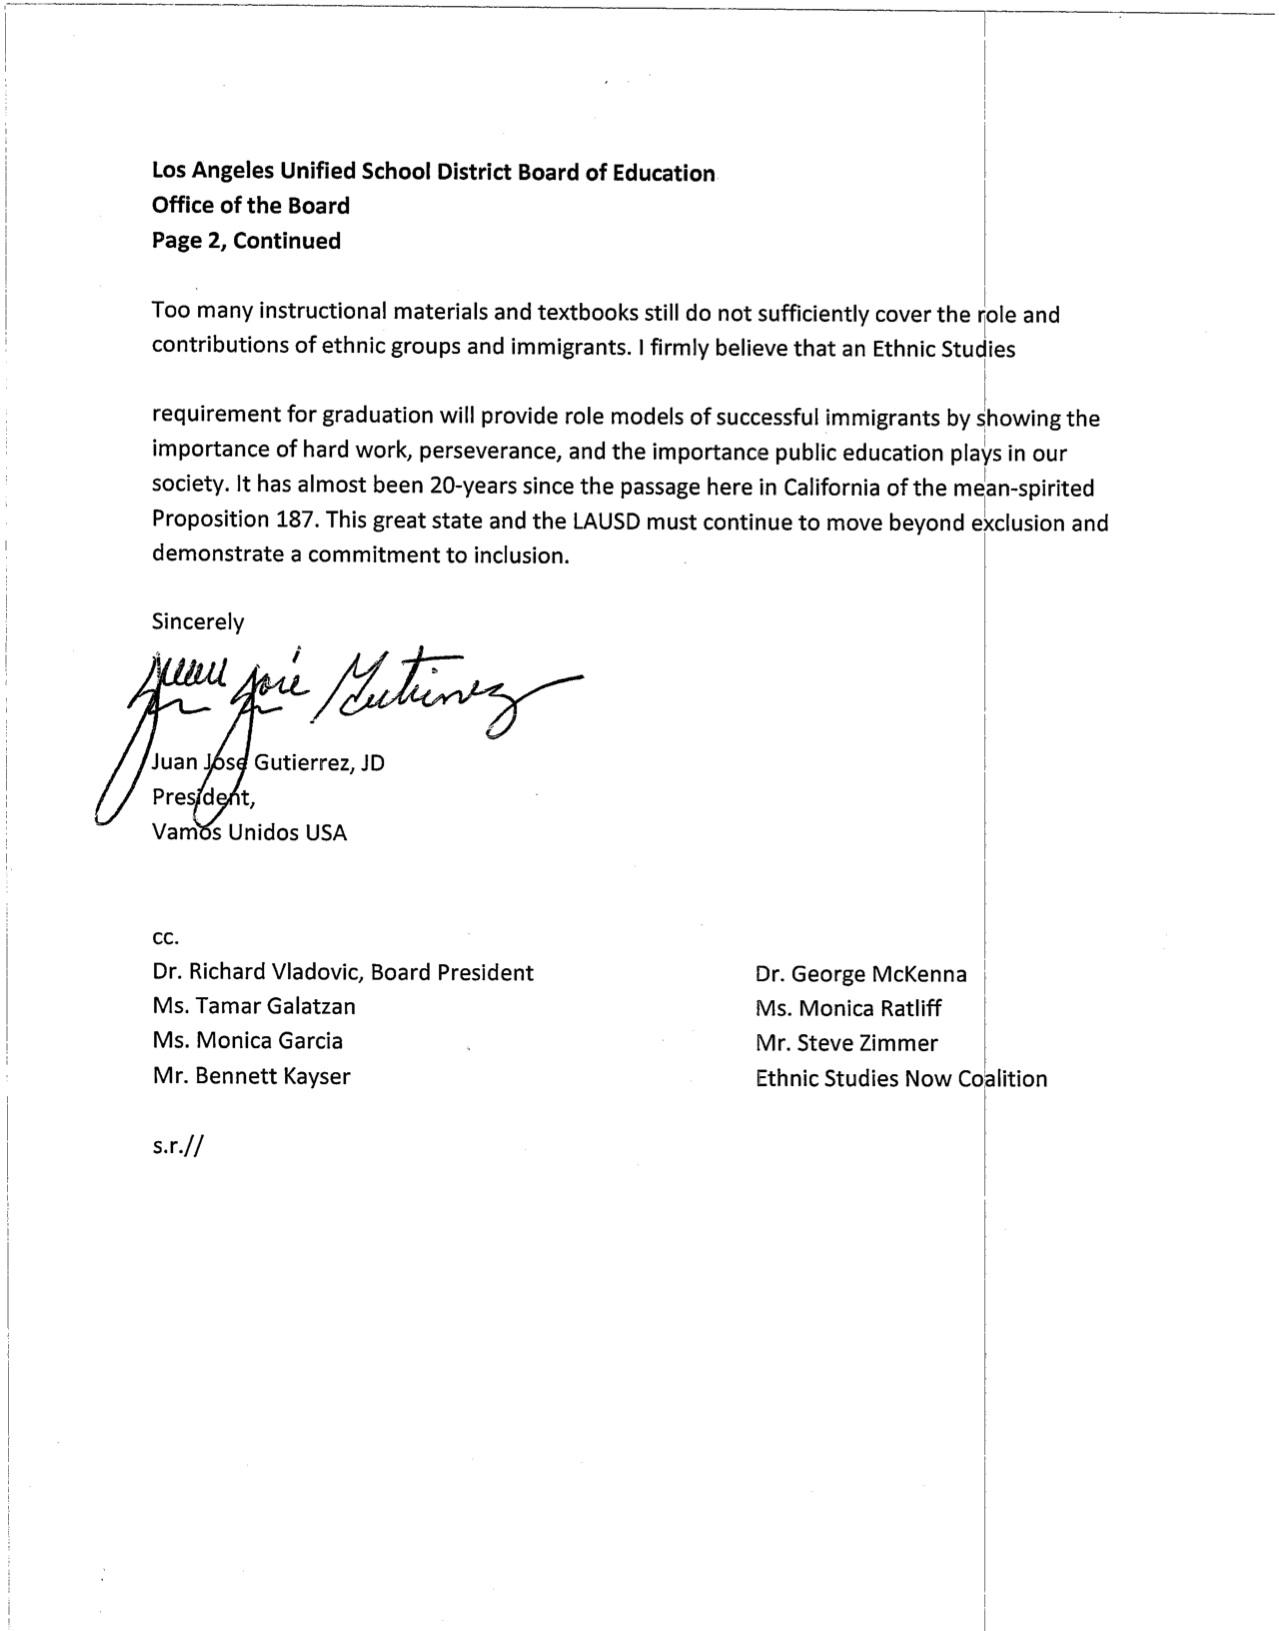 Letter_10-03-14_Juan_Jose_Gutierrez_p2.jpg